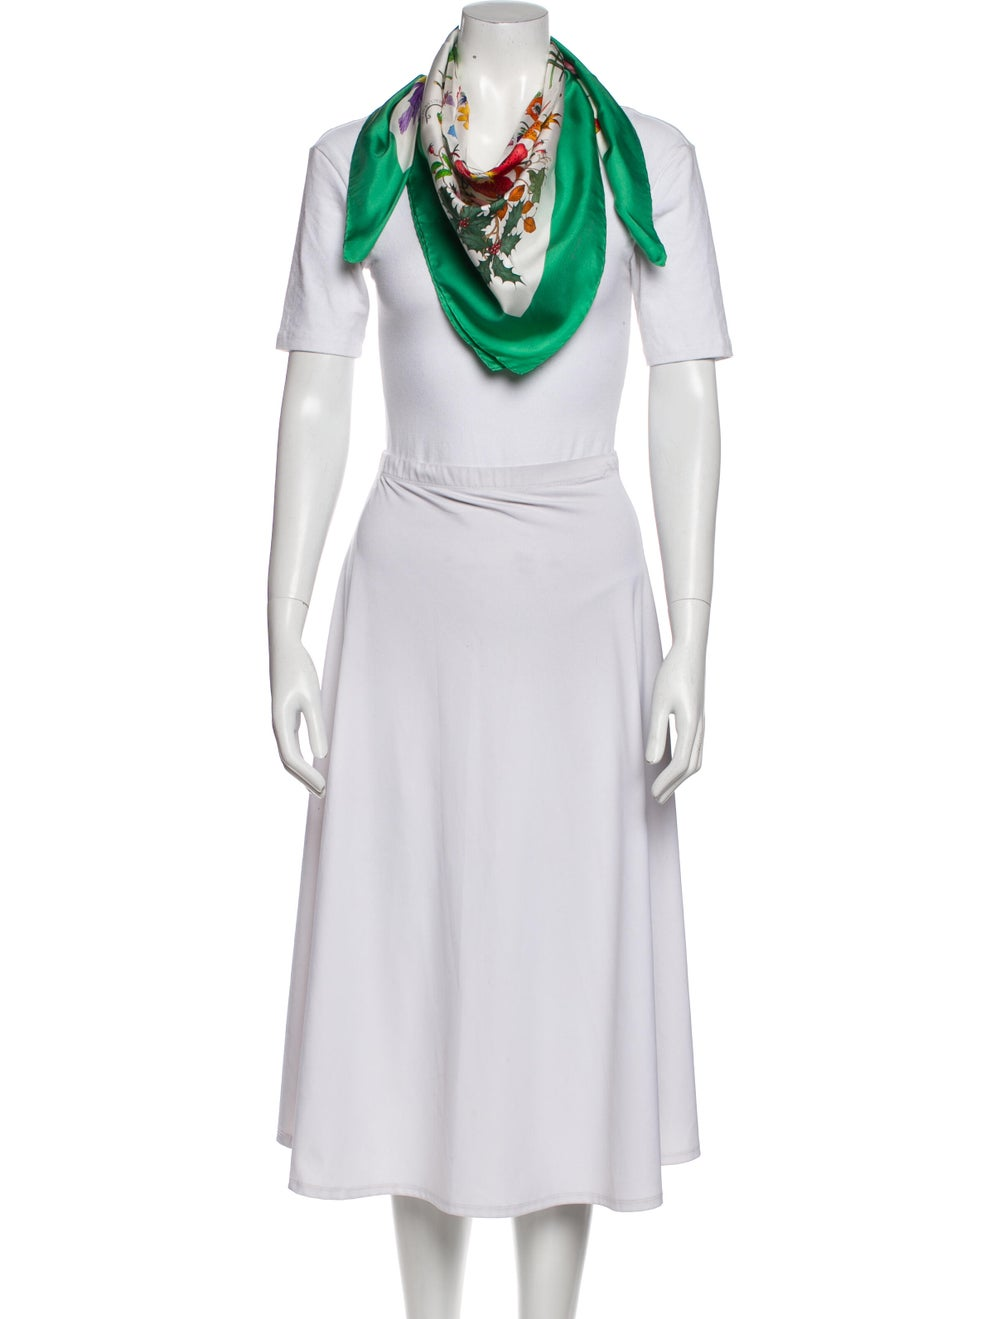 Gucci Silk Floral Print Scarf Green - image 3